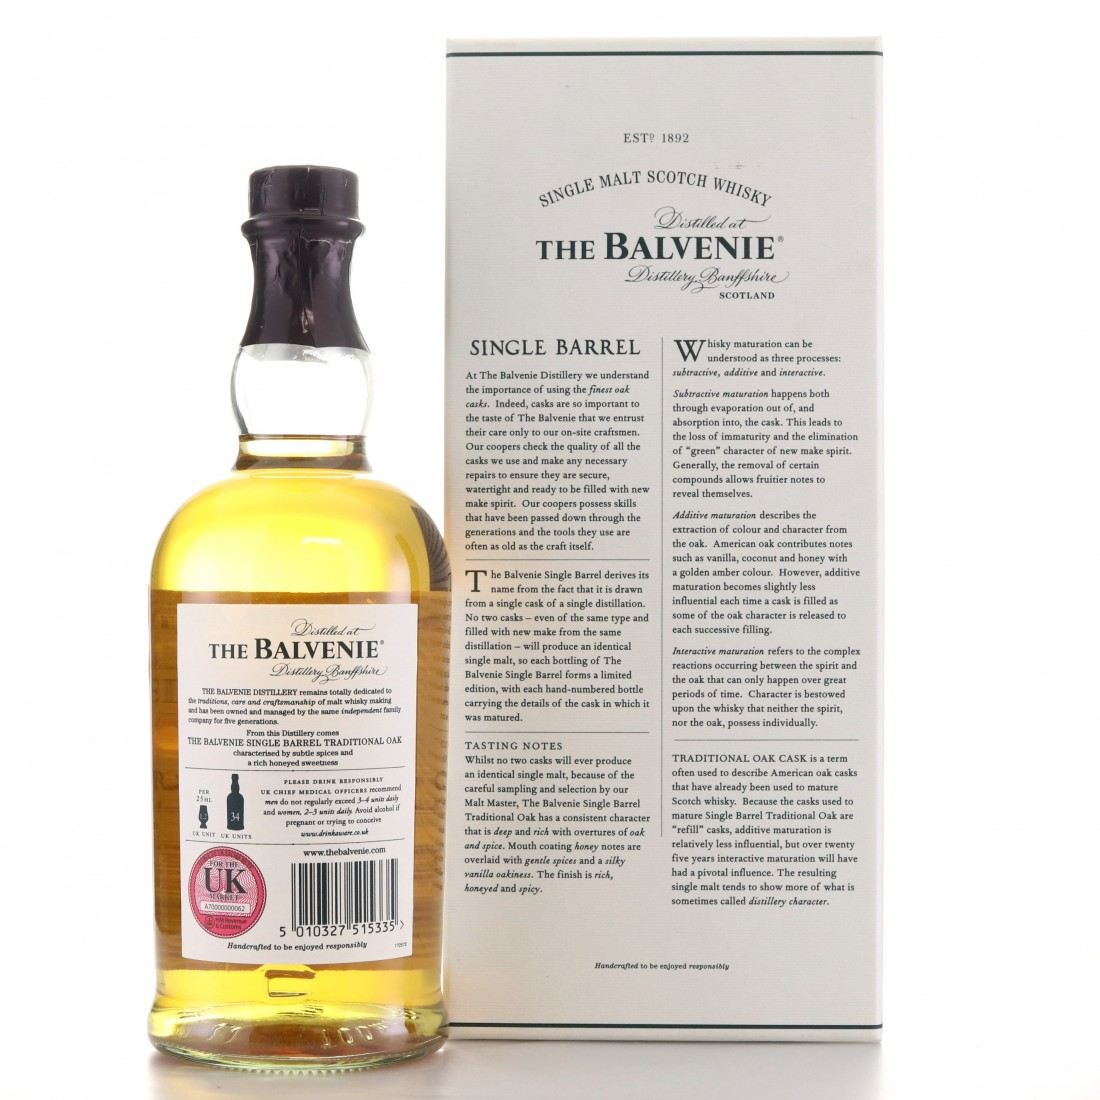 Balvenie 1989 Single Barrel 25 Year Old #1869